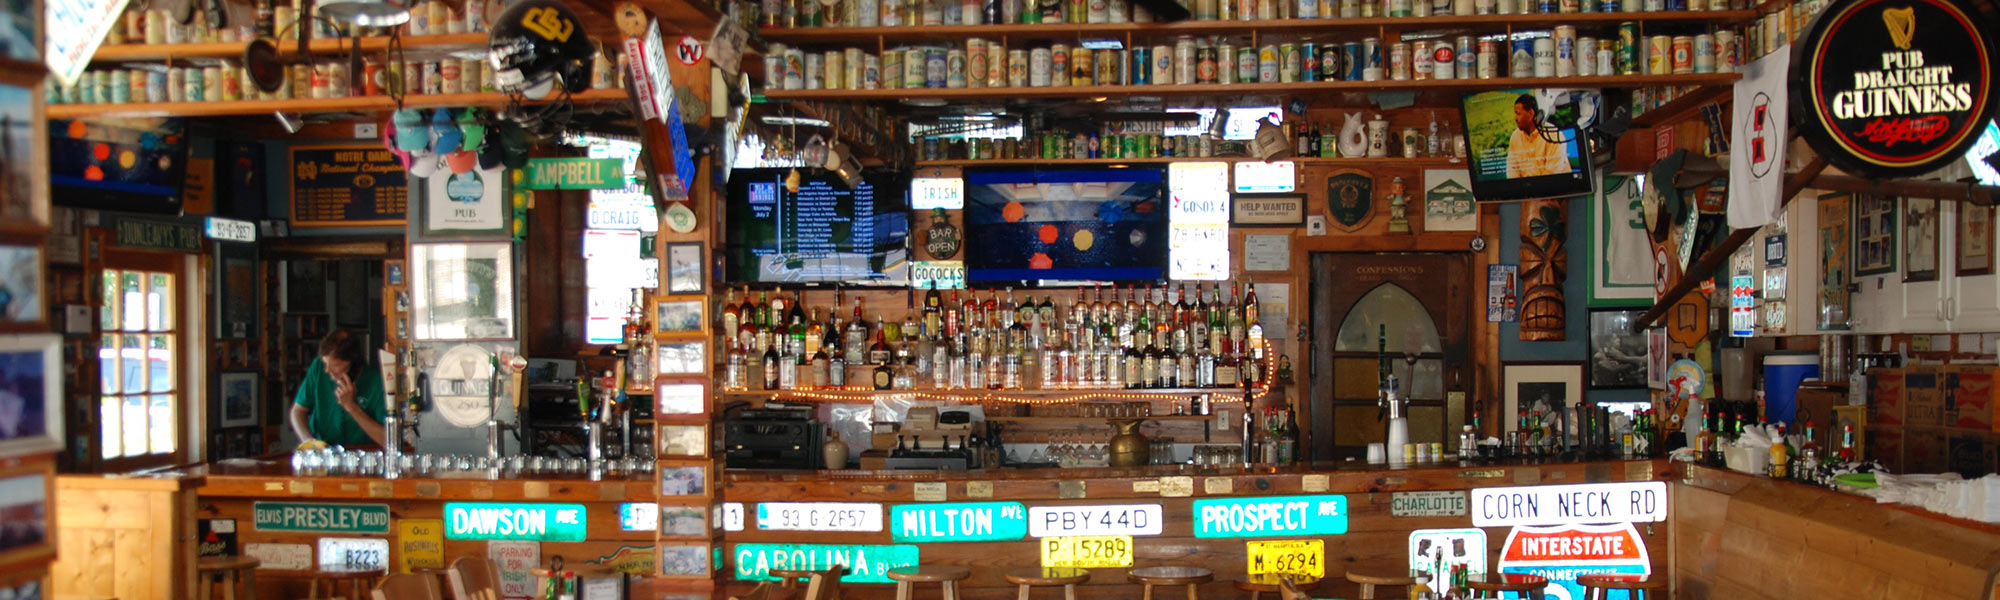 Dunleavy's Pub Home Page Slider 1